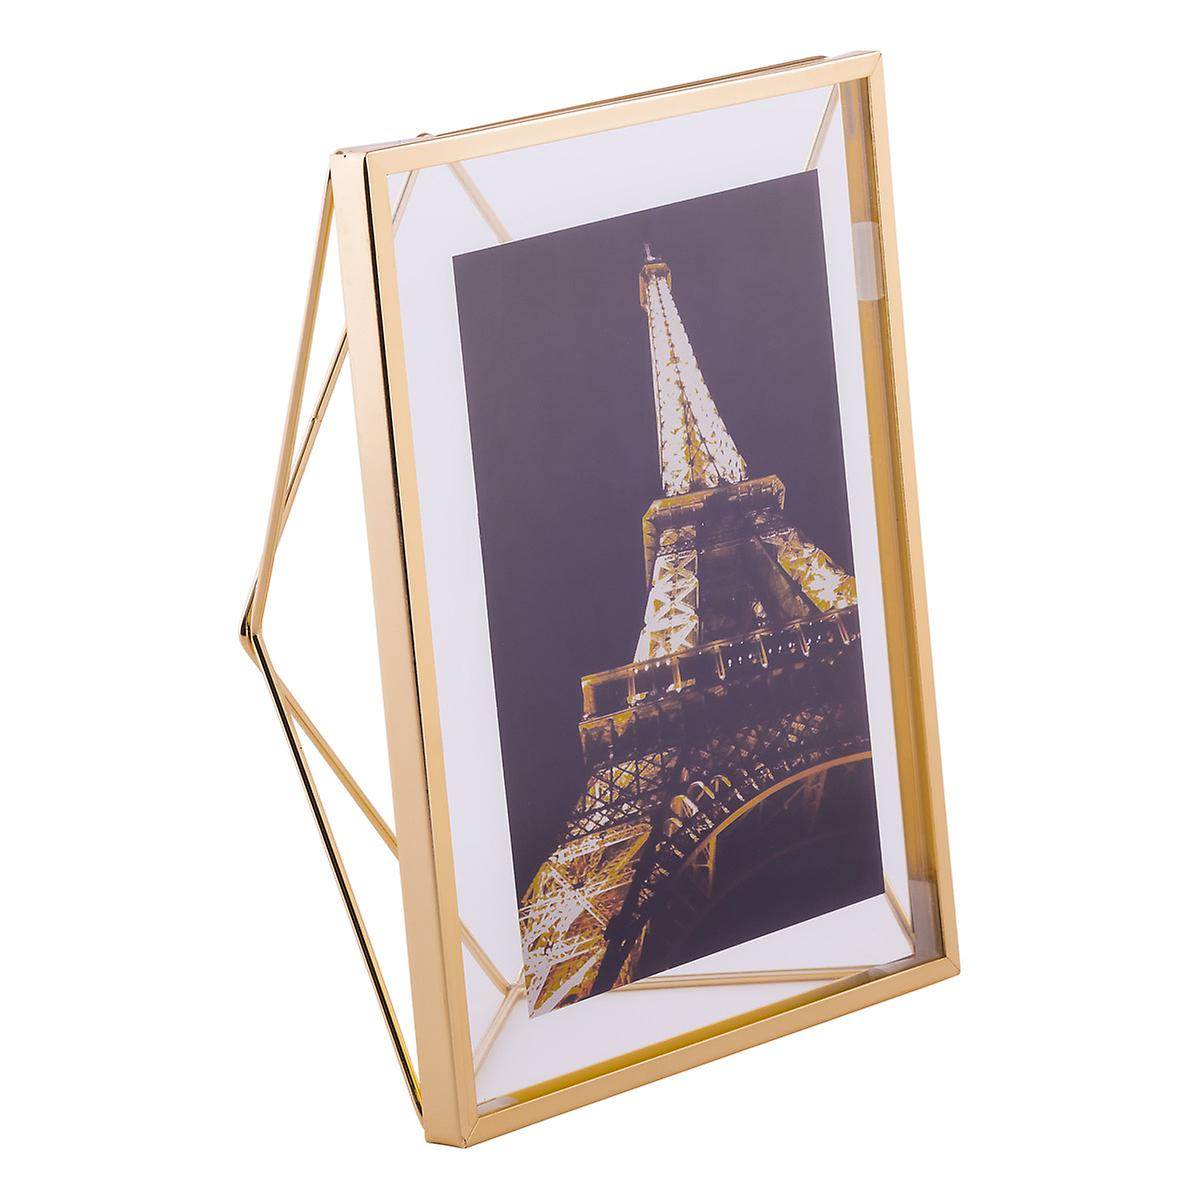 prisma photo frames by umbra